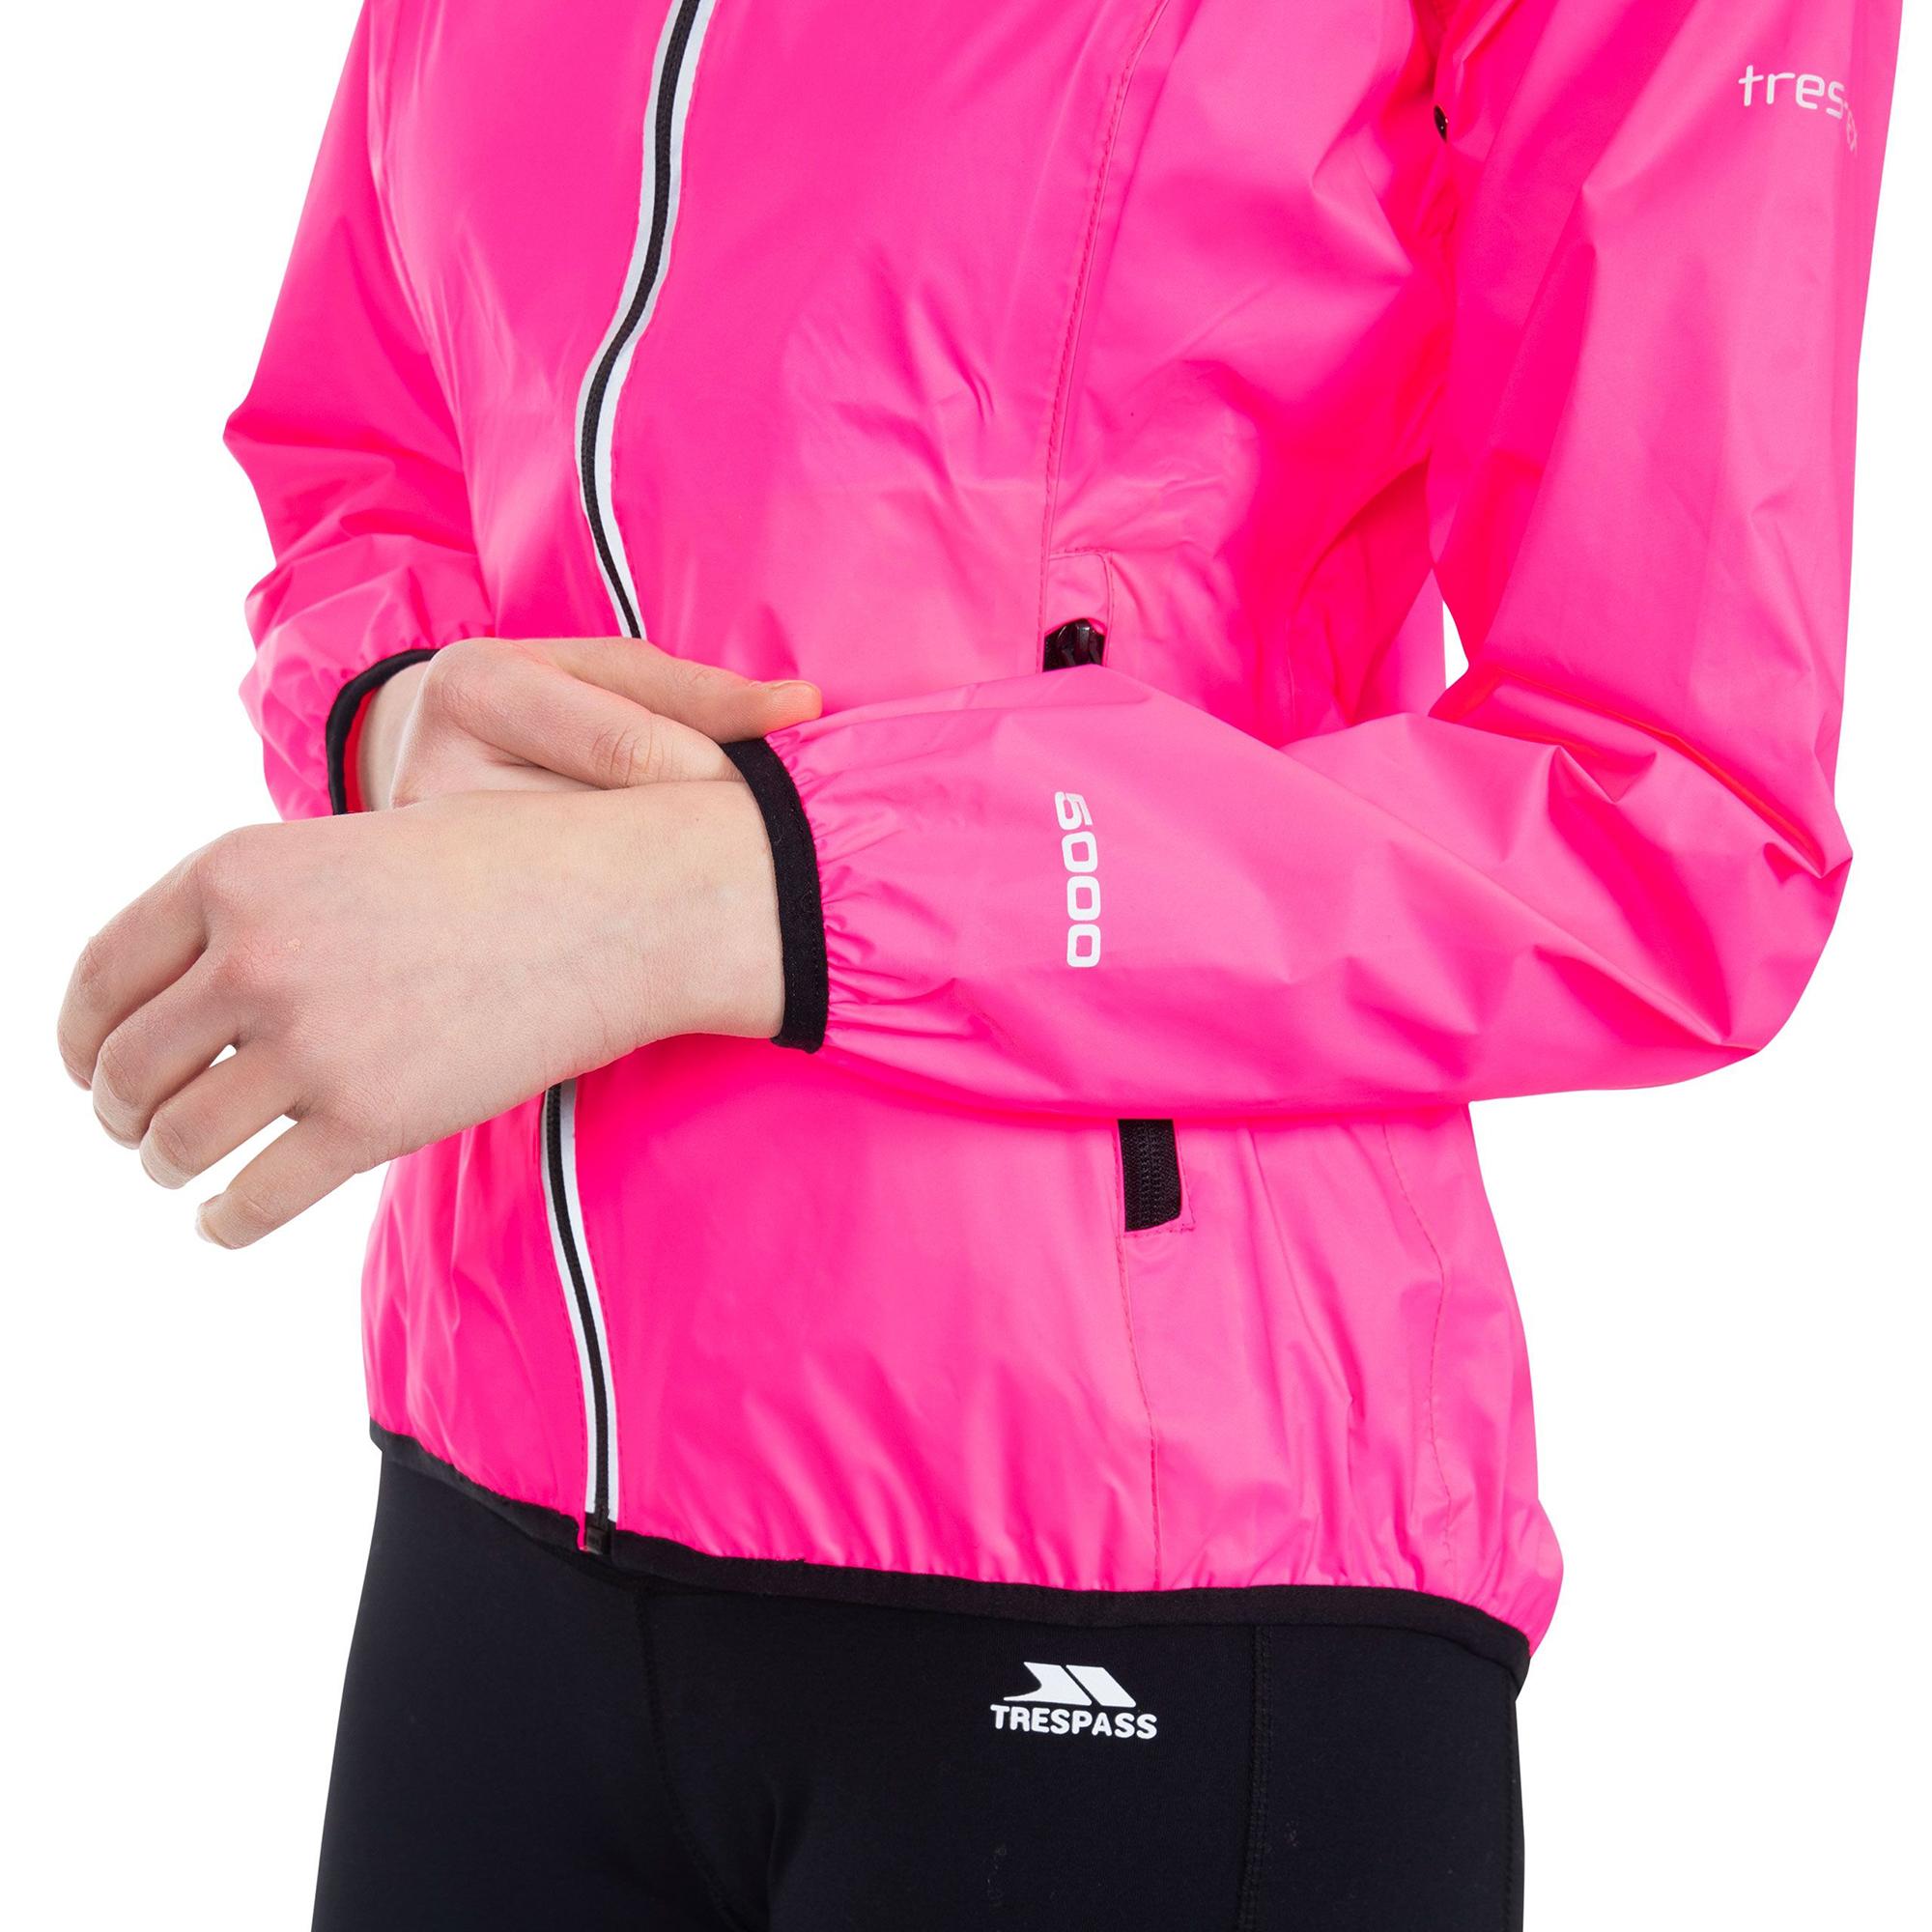 Trespass-Womens-Ladies-Beaming-Packaway-Hi-Vis-Jacket-TP4616 thumbnail 7